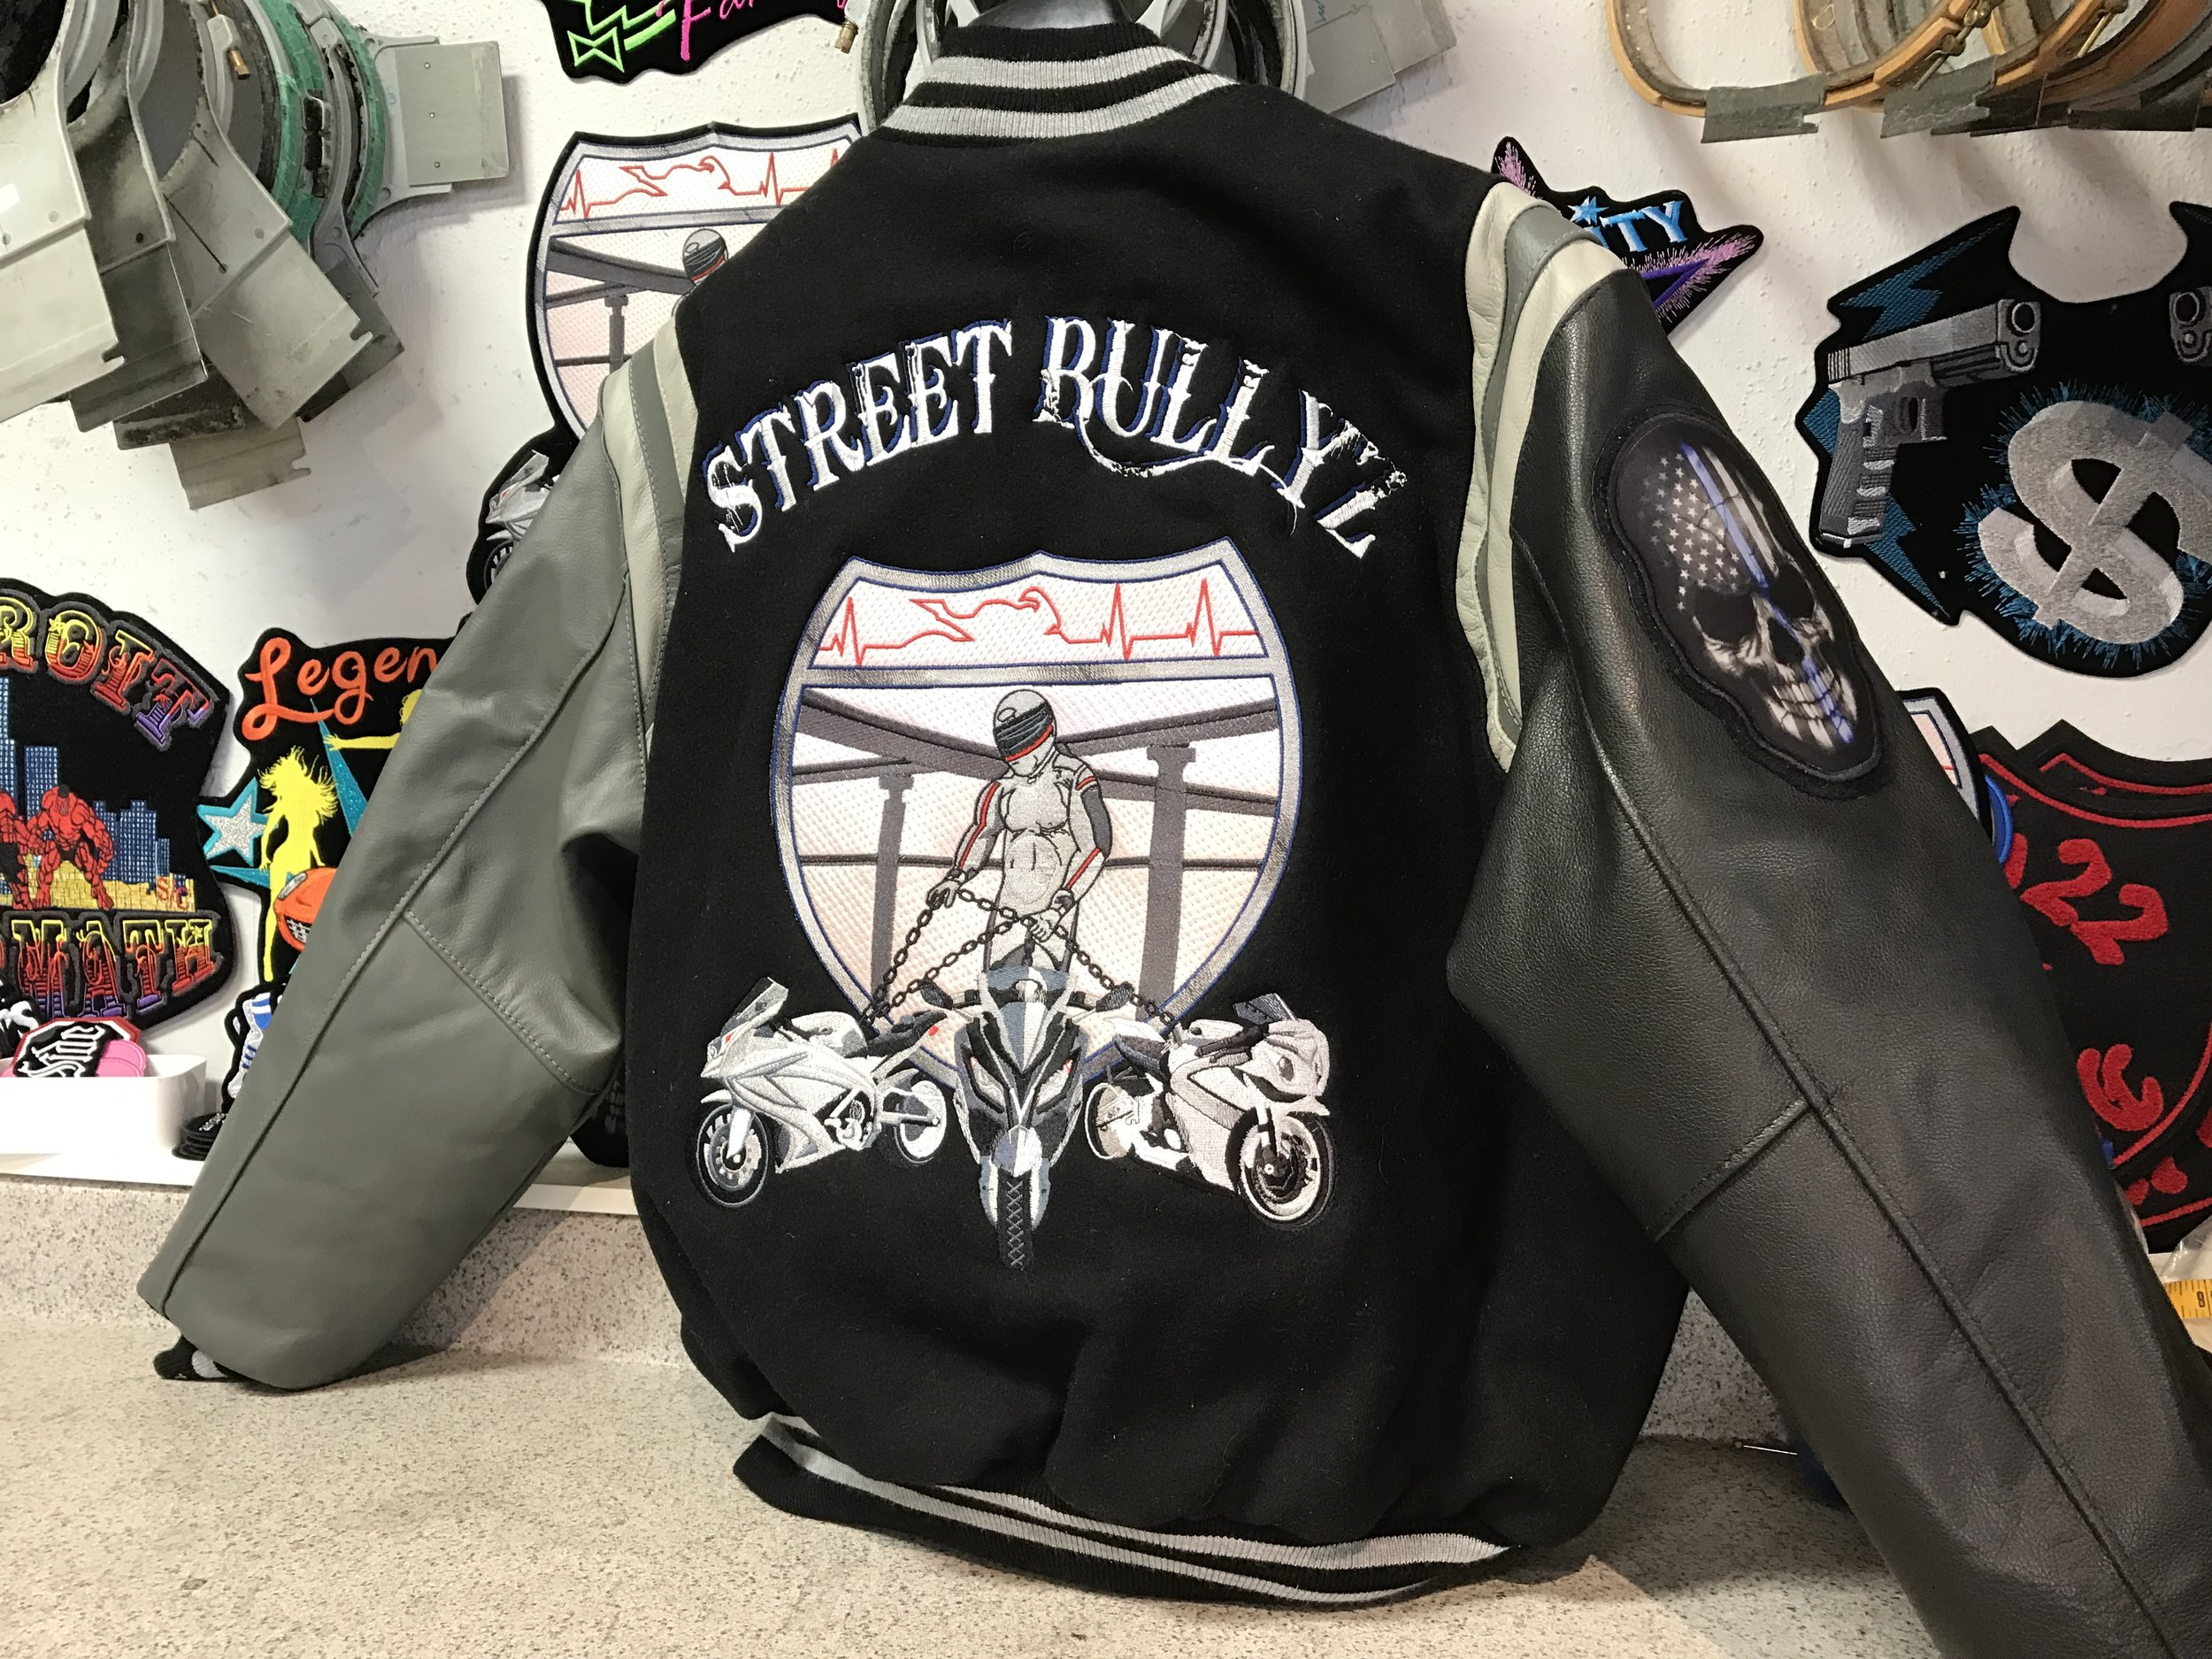 Streetbullys2017-03-16 18.33.42 (6).jpg